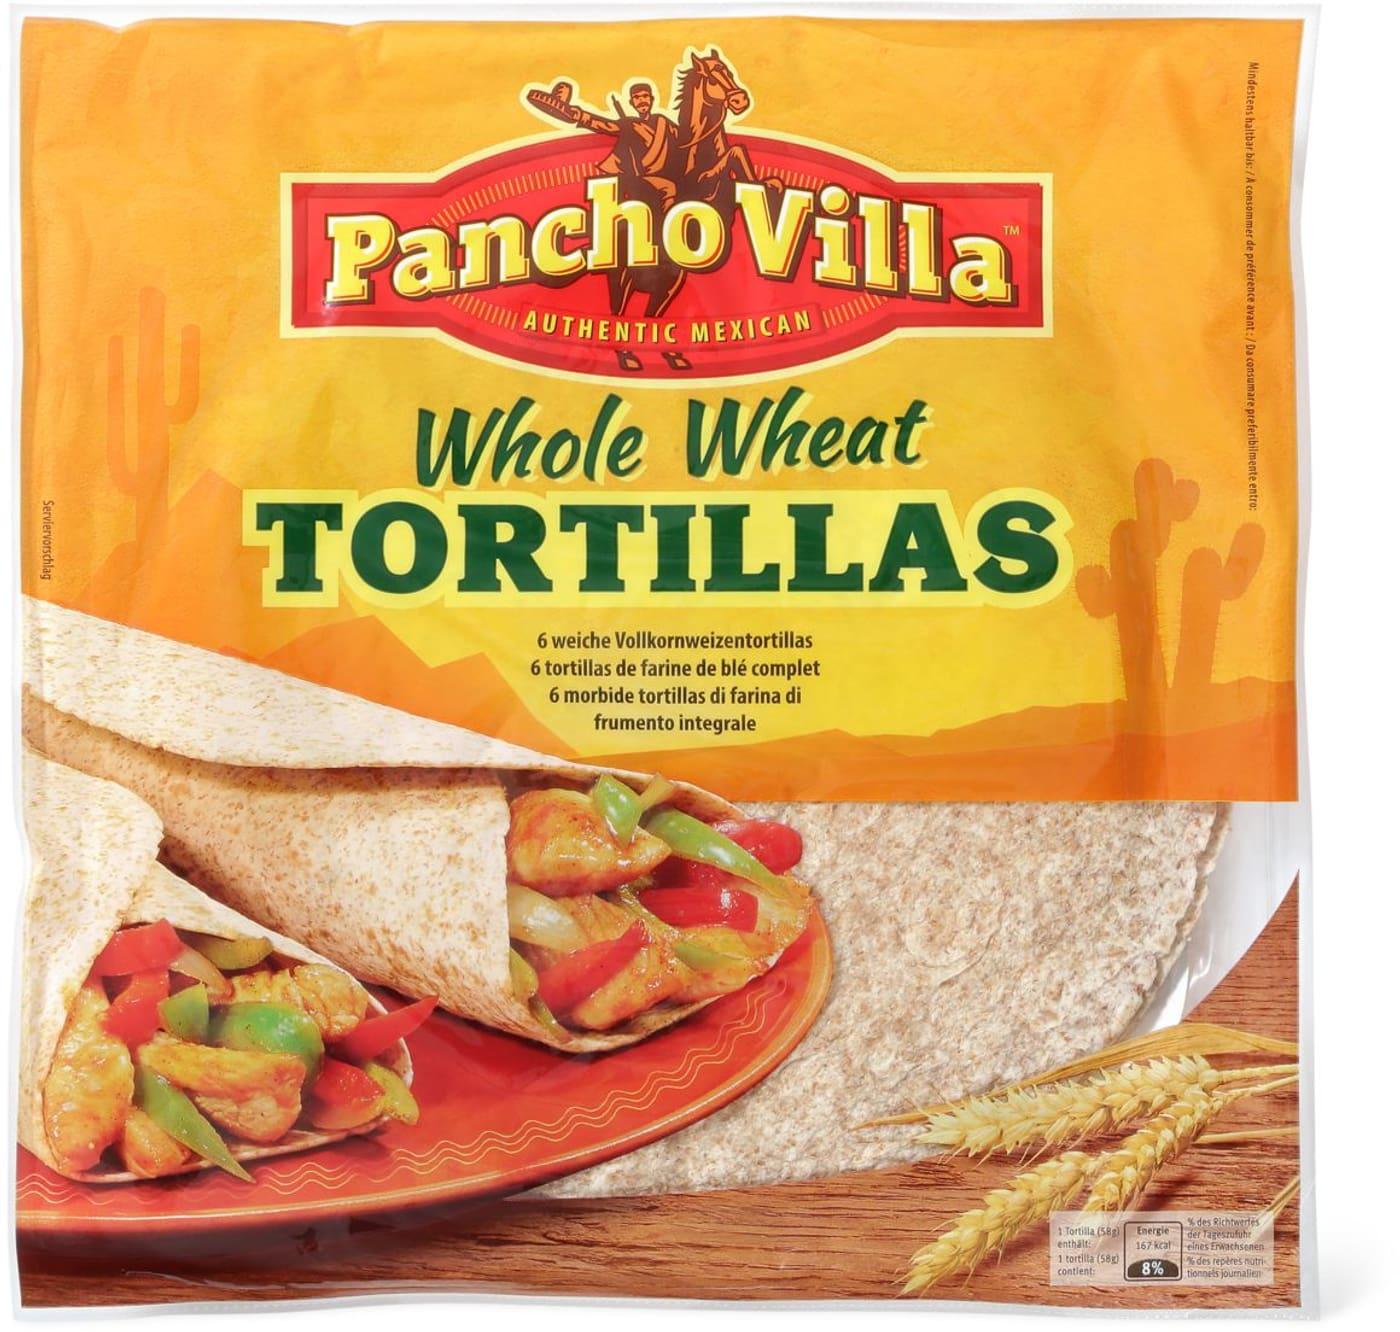 Energiewert Haus: Pancho Villa Whole Wheat Tortilla 6 Stk